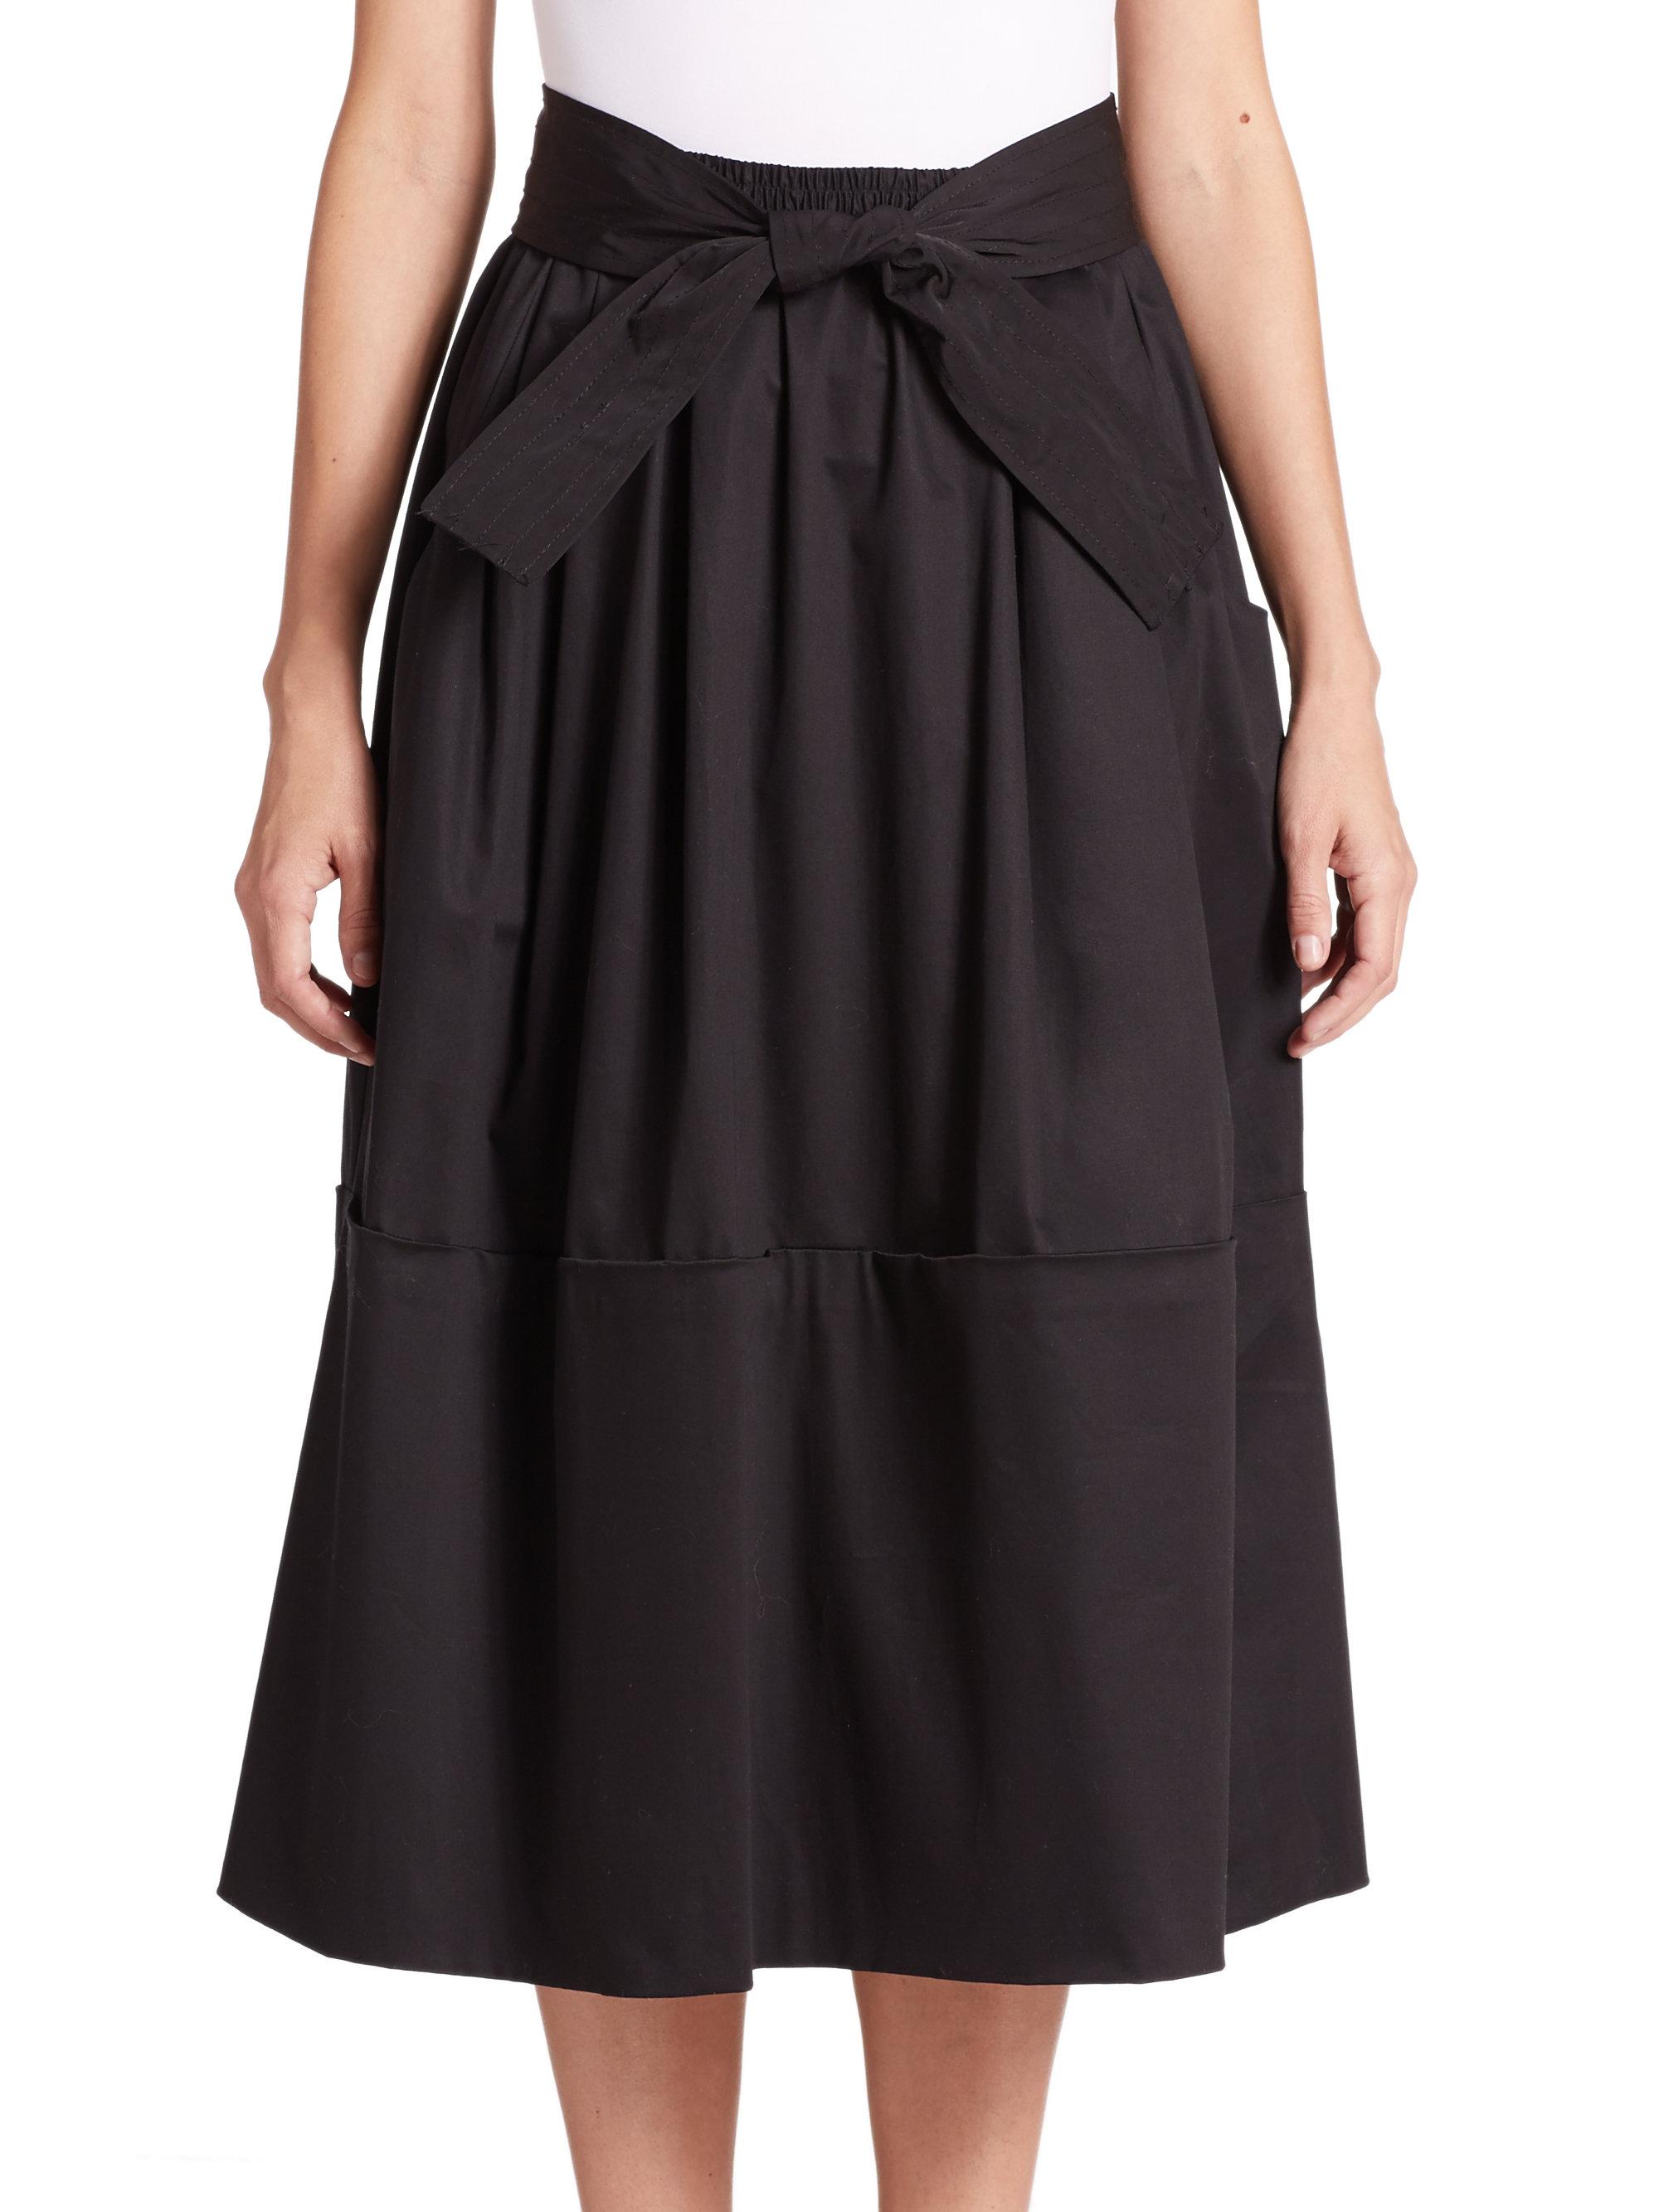 Lyst - Tome Cotton Sateen Dirndl Skirt in Black